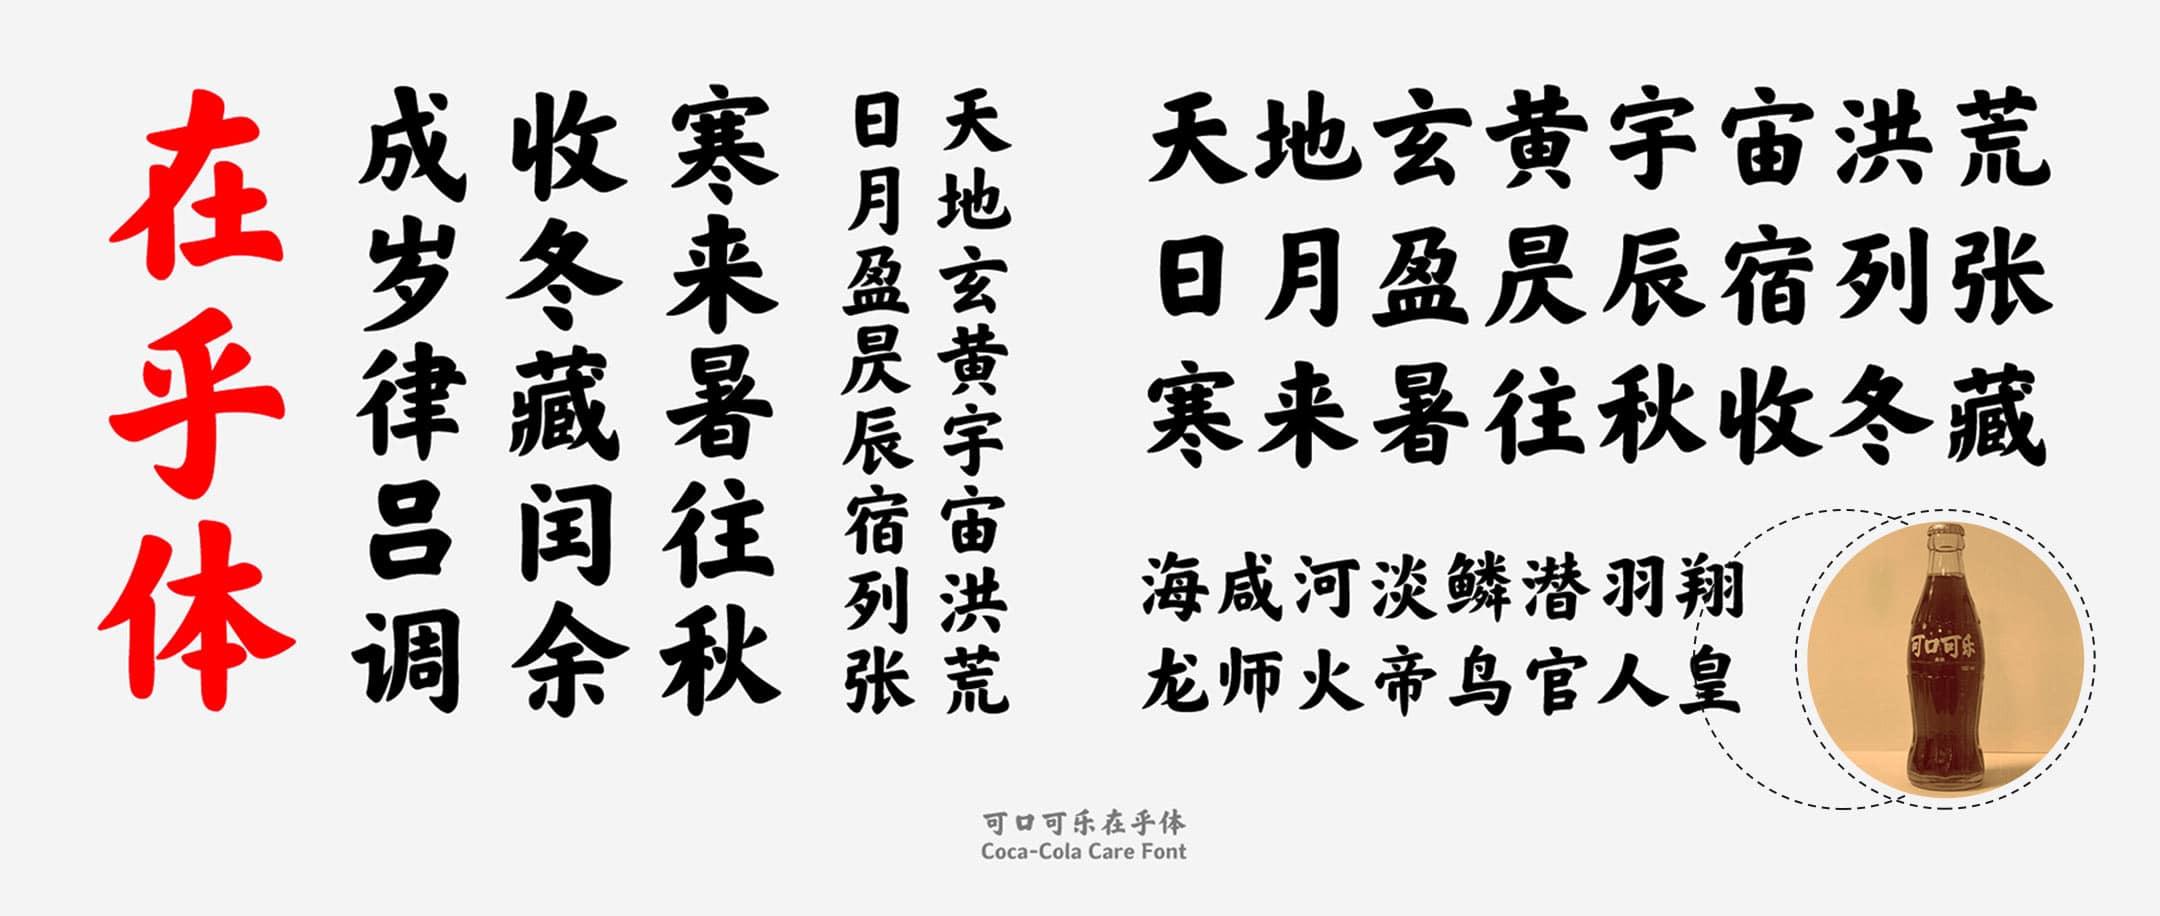 https://cdn1.zijia.com.cn/Public/Uploads/mainsort/mainsort_1588935061_2382.jpg